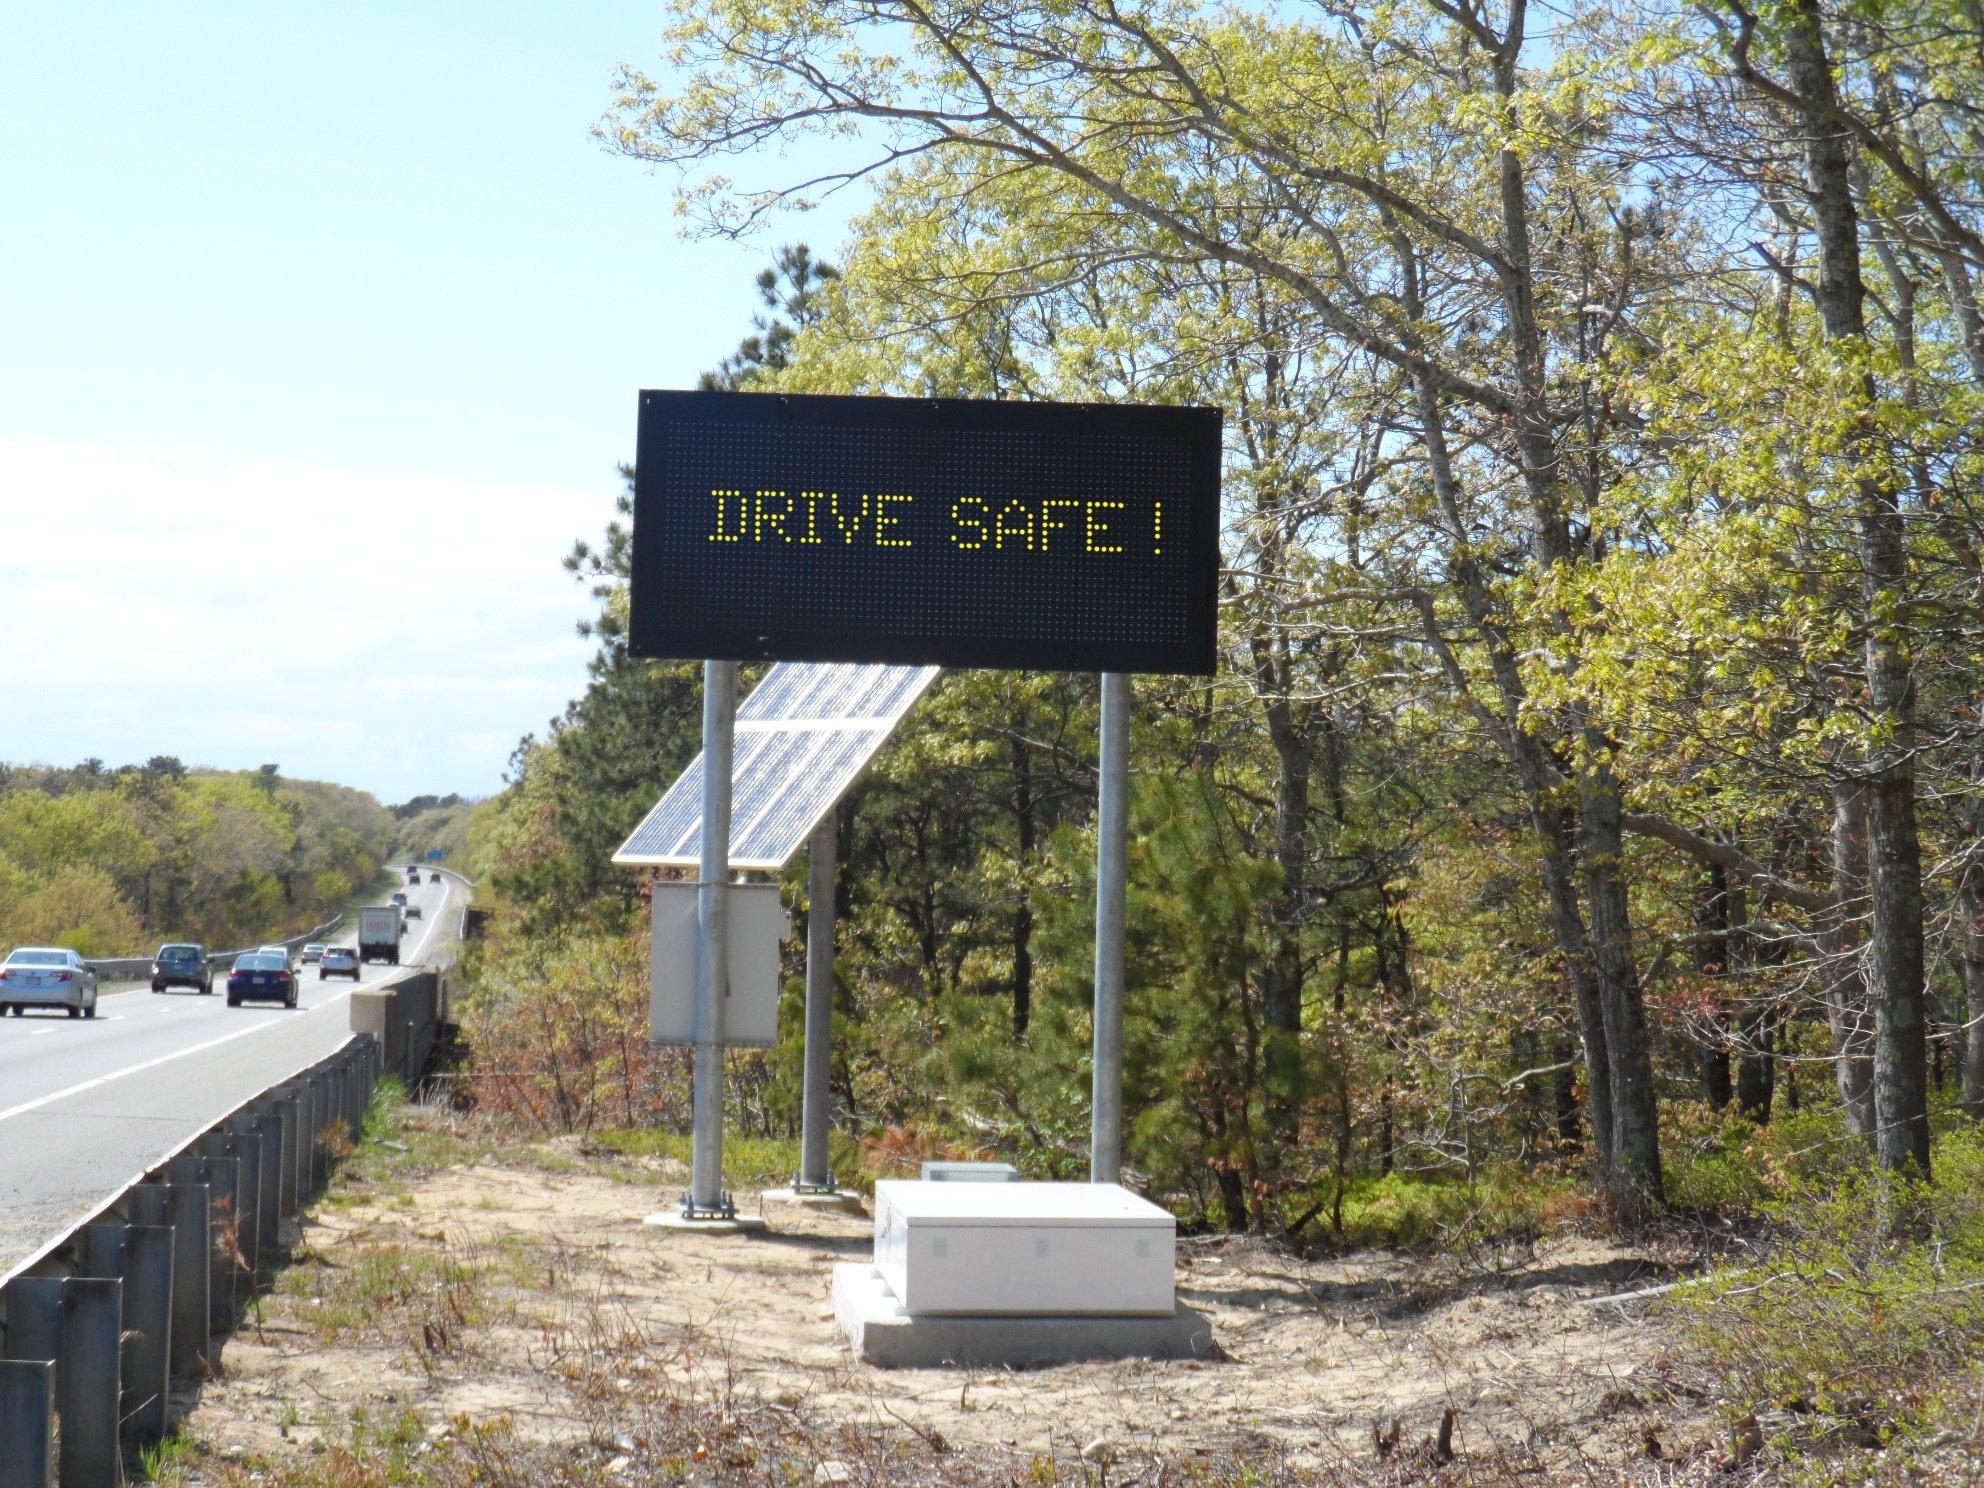 vms pricing drive_safe_mass_DMS.jpg